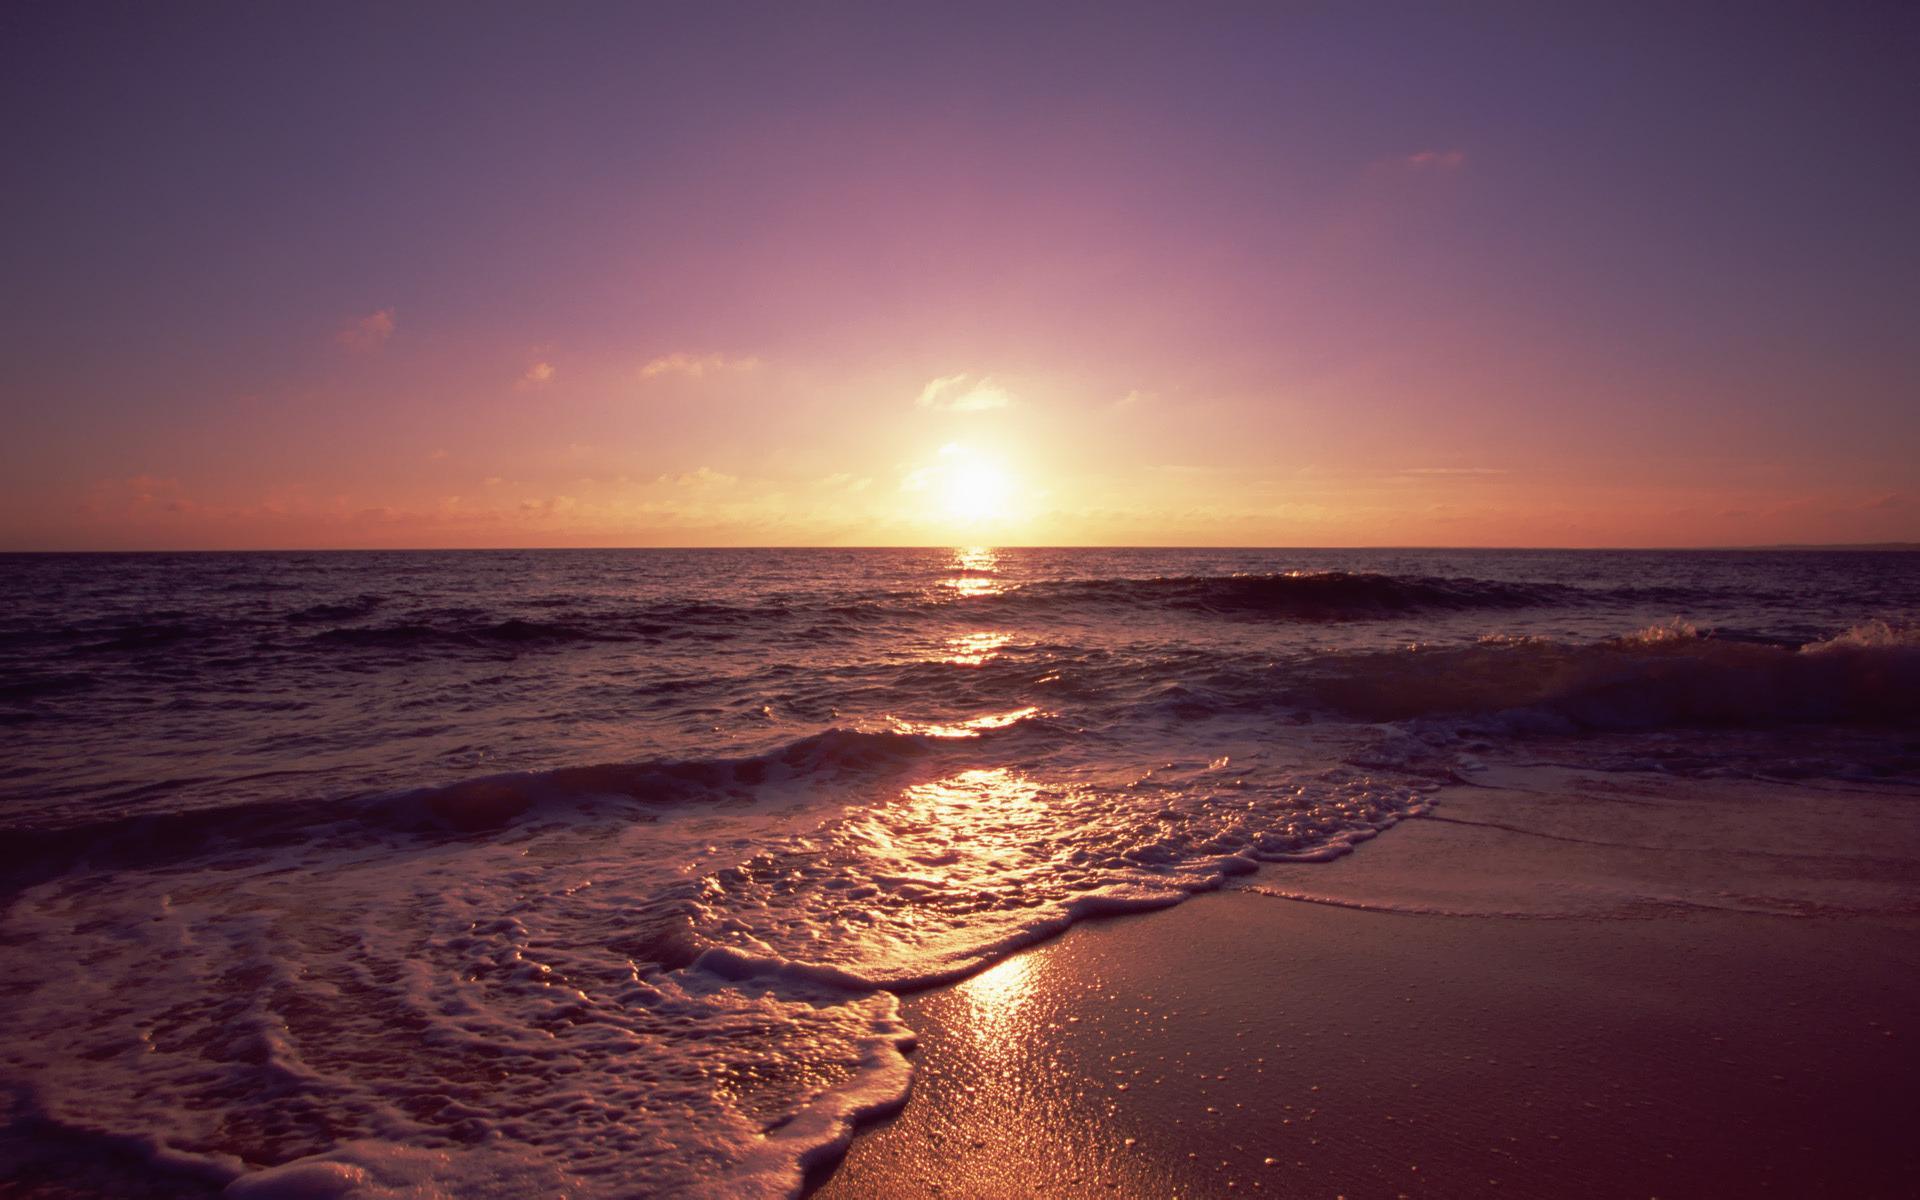 Пляж песок горизонт закат фон 1920x1200